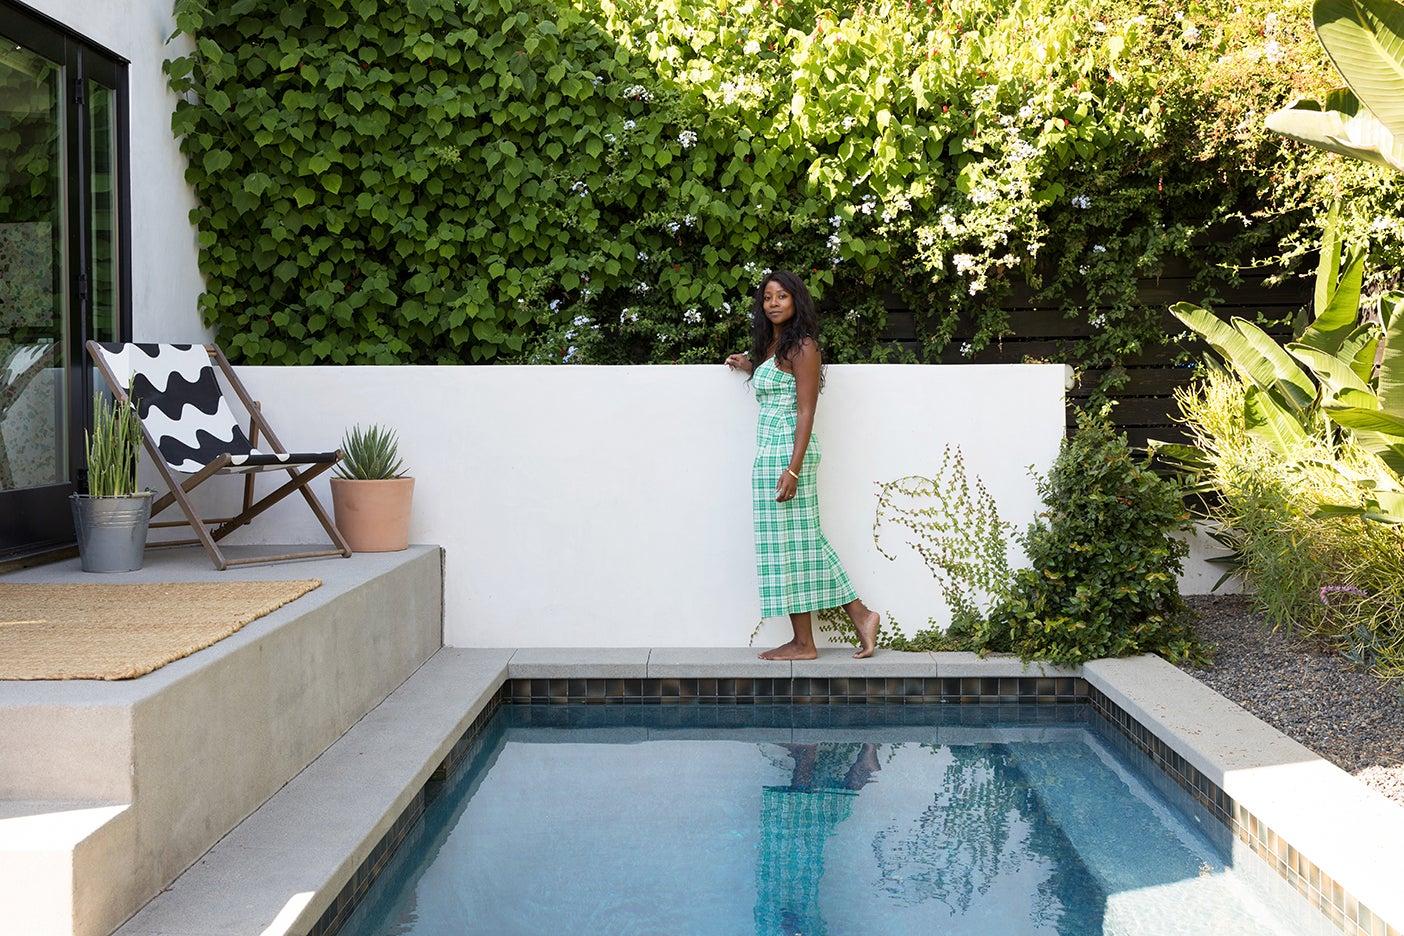 camilla Blackett walking by pool